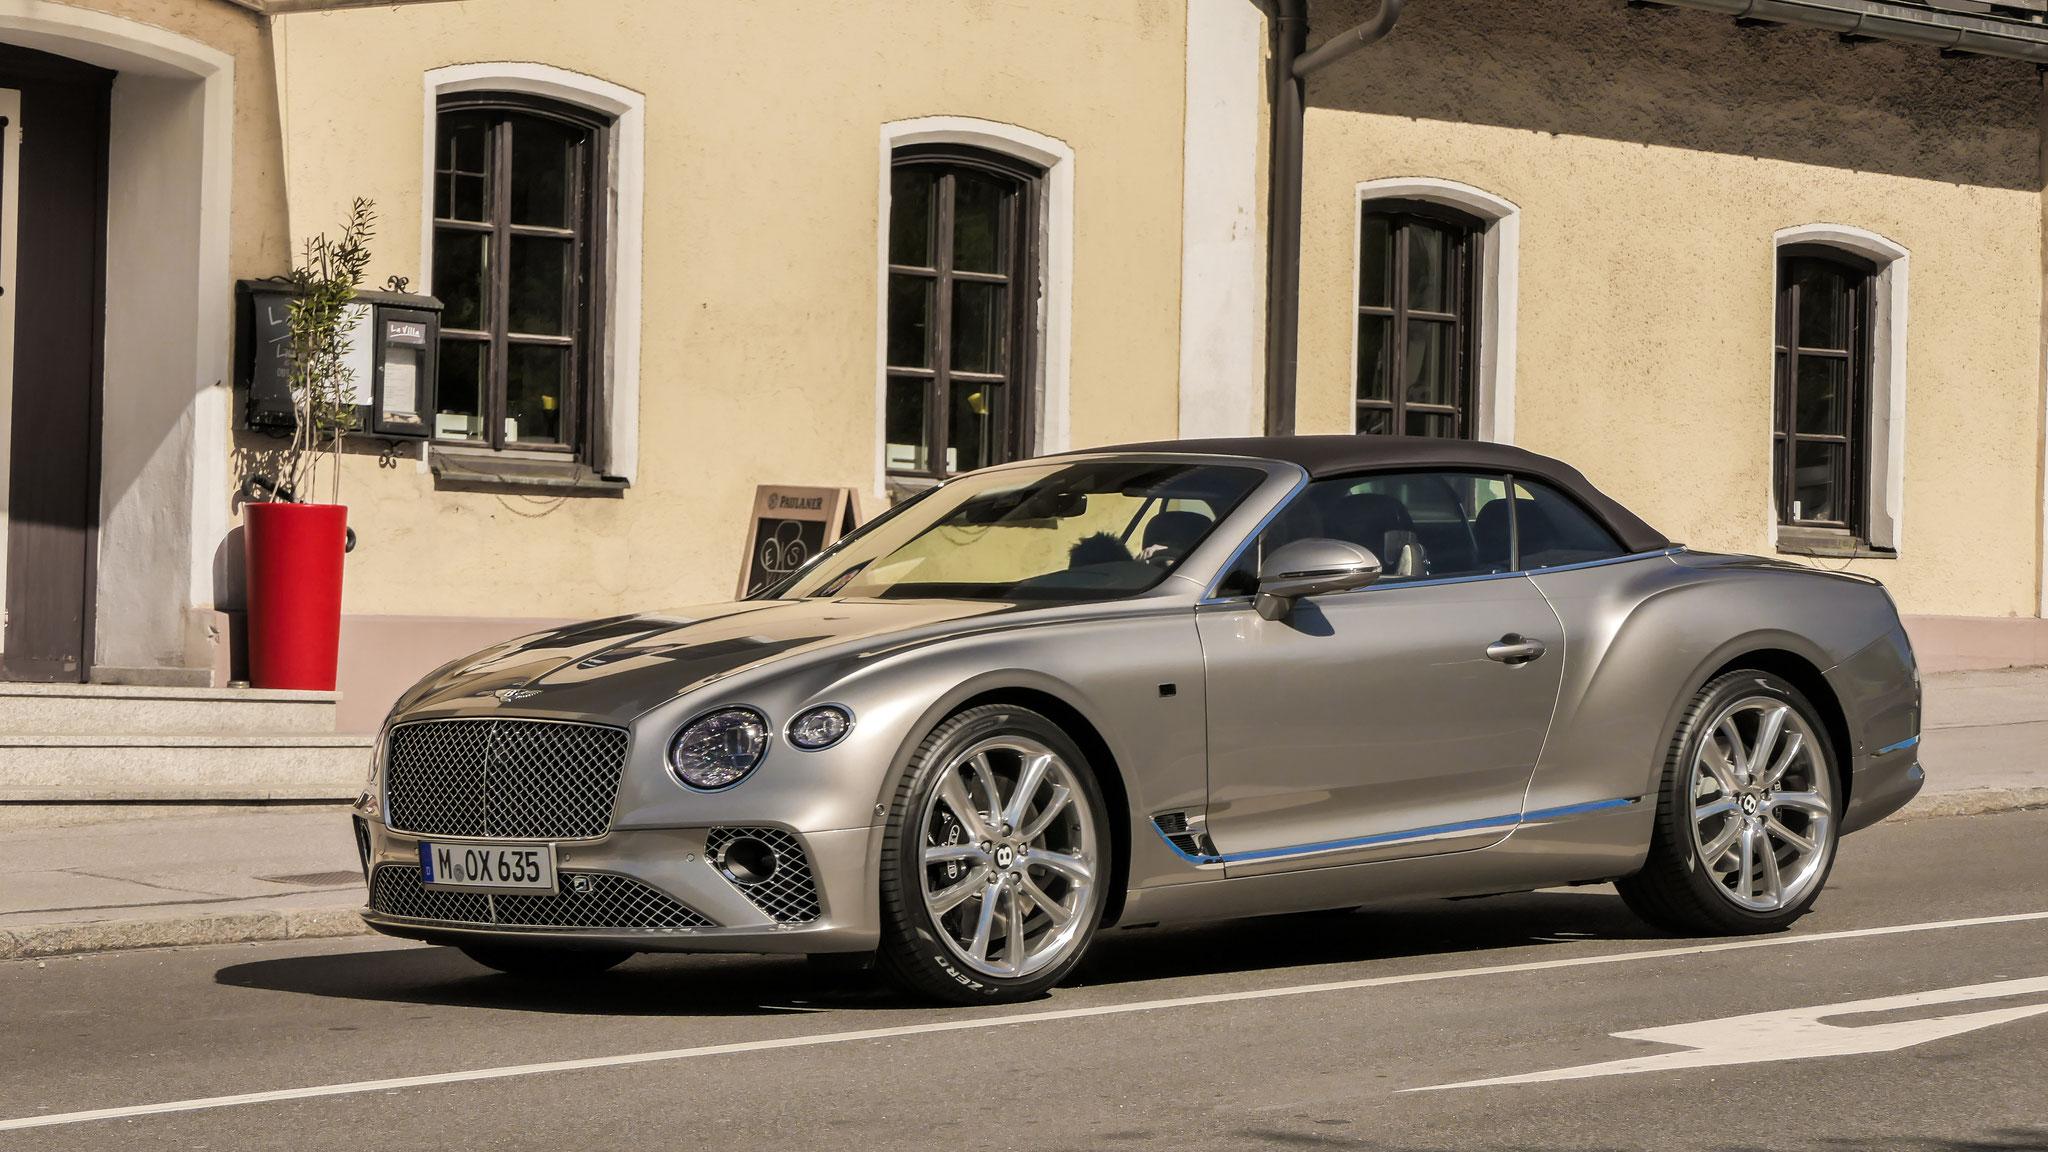 Bentley Continental GTC - M-OX-635